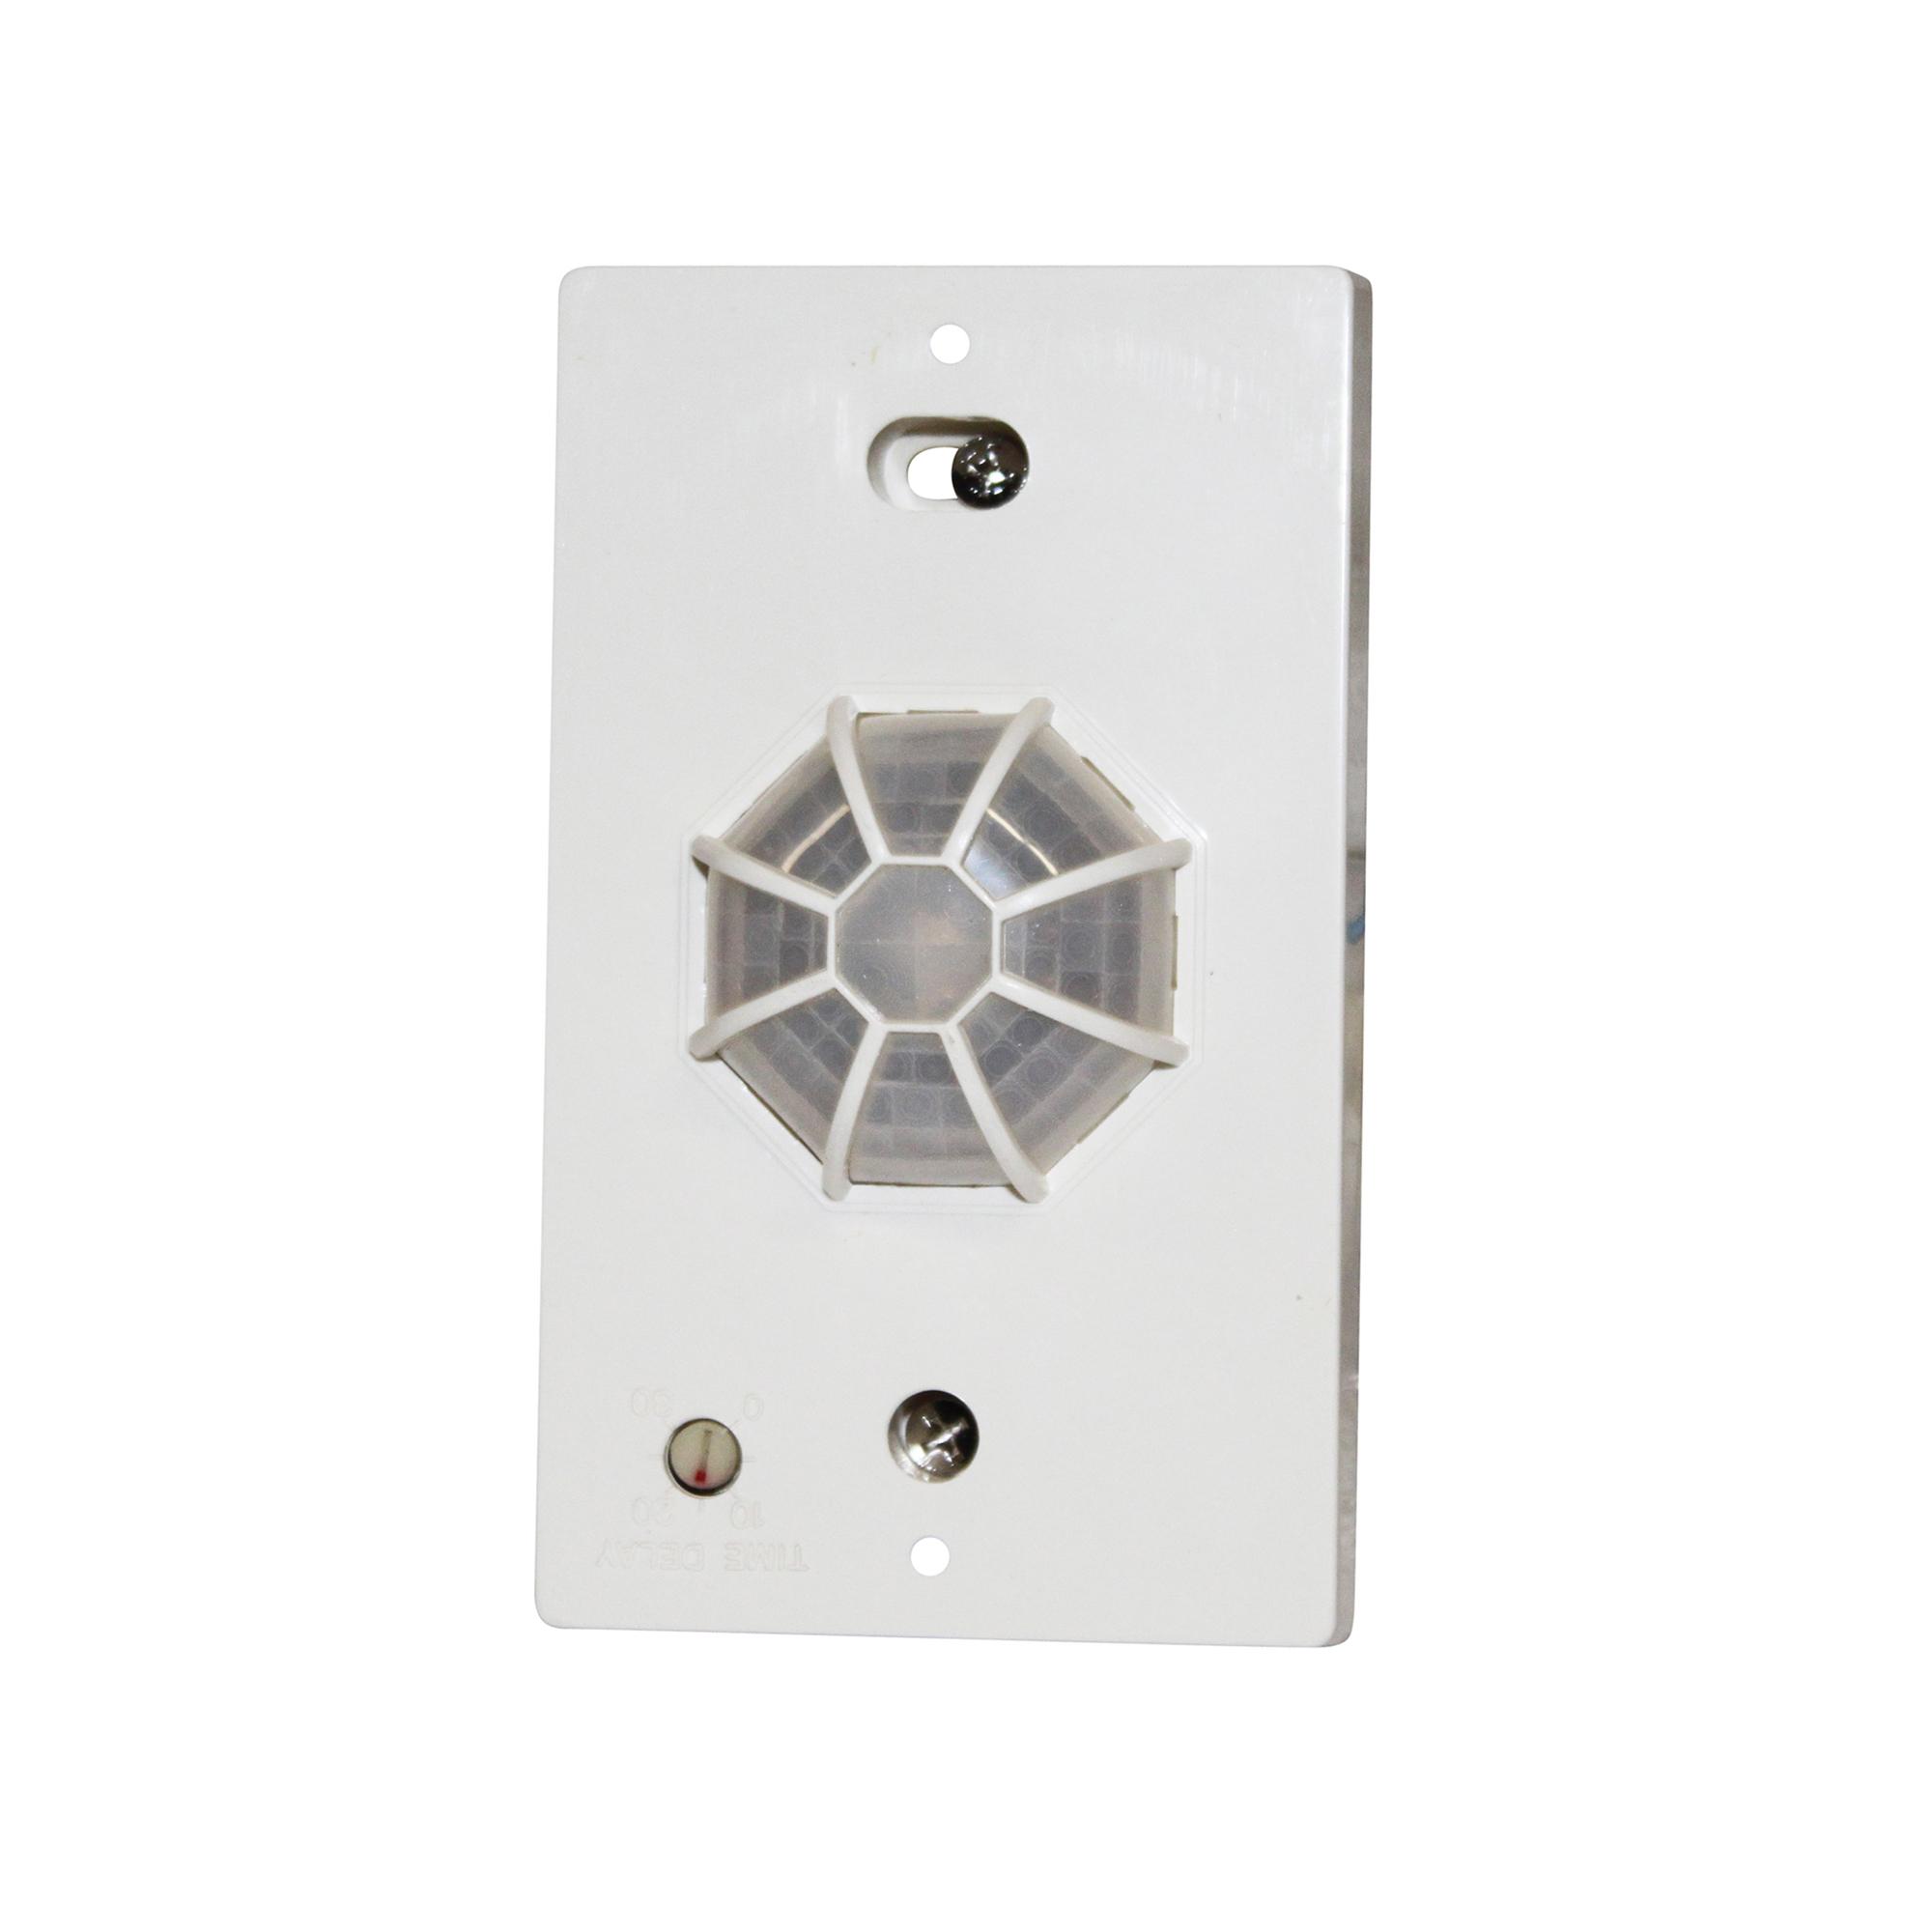 watt stopper lighting control panel wiring diagram low